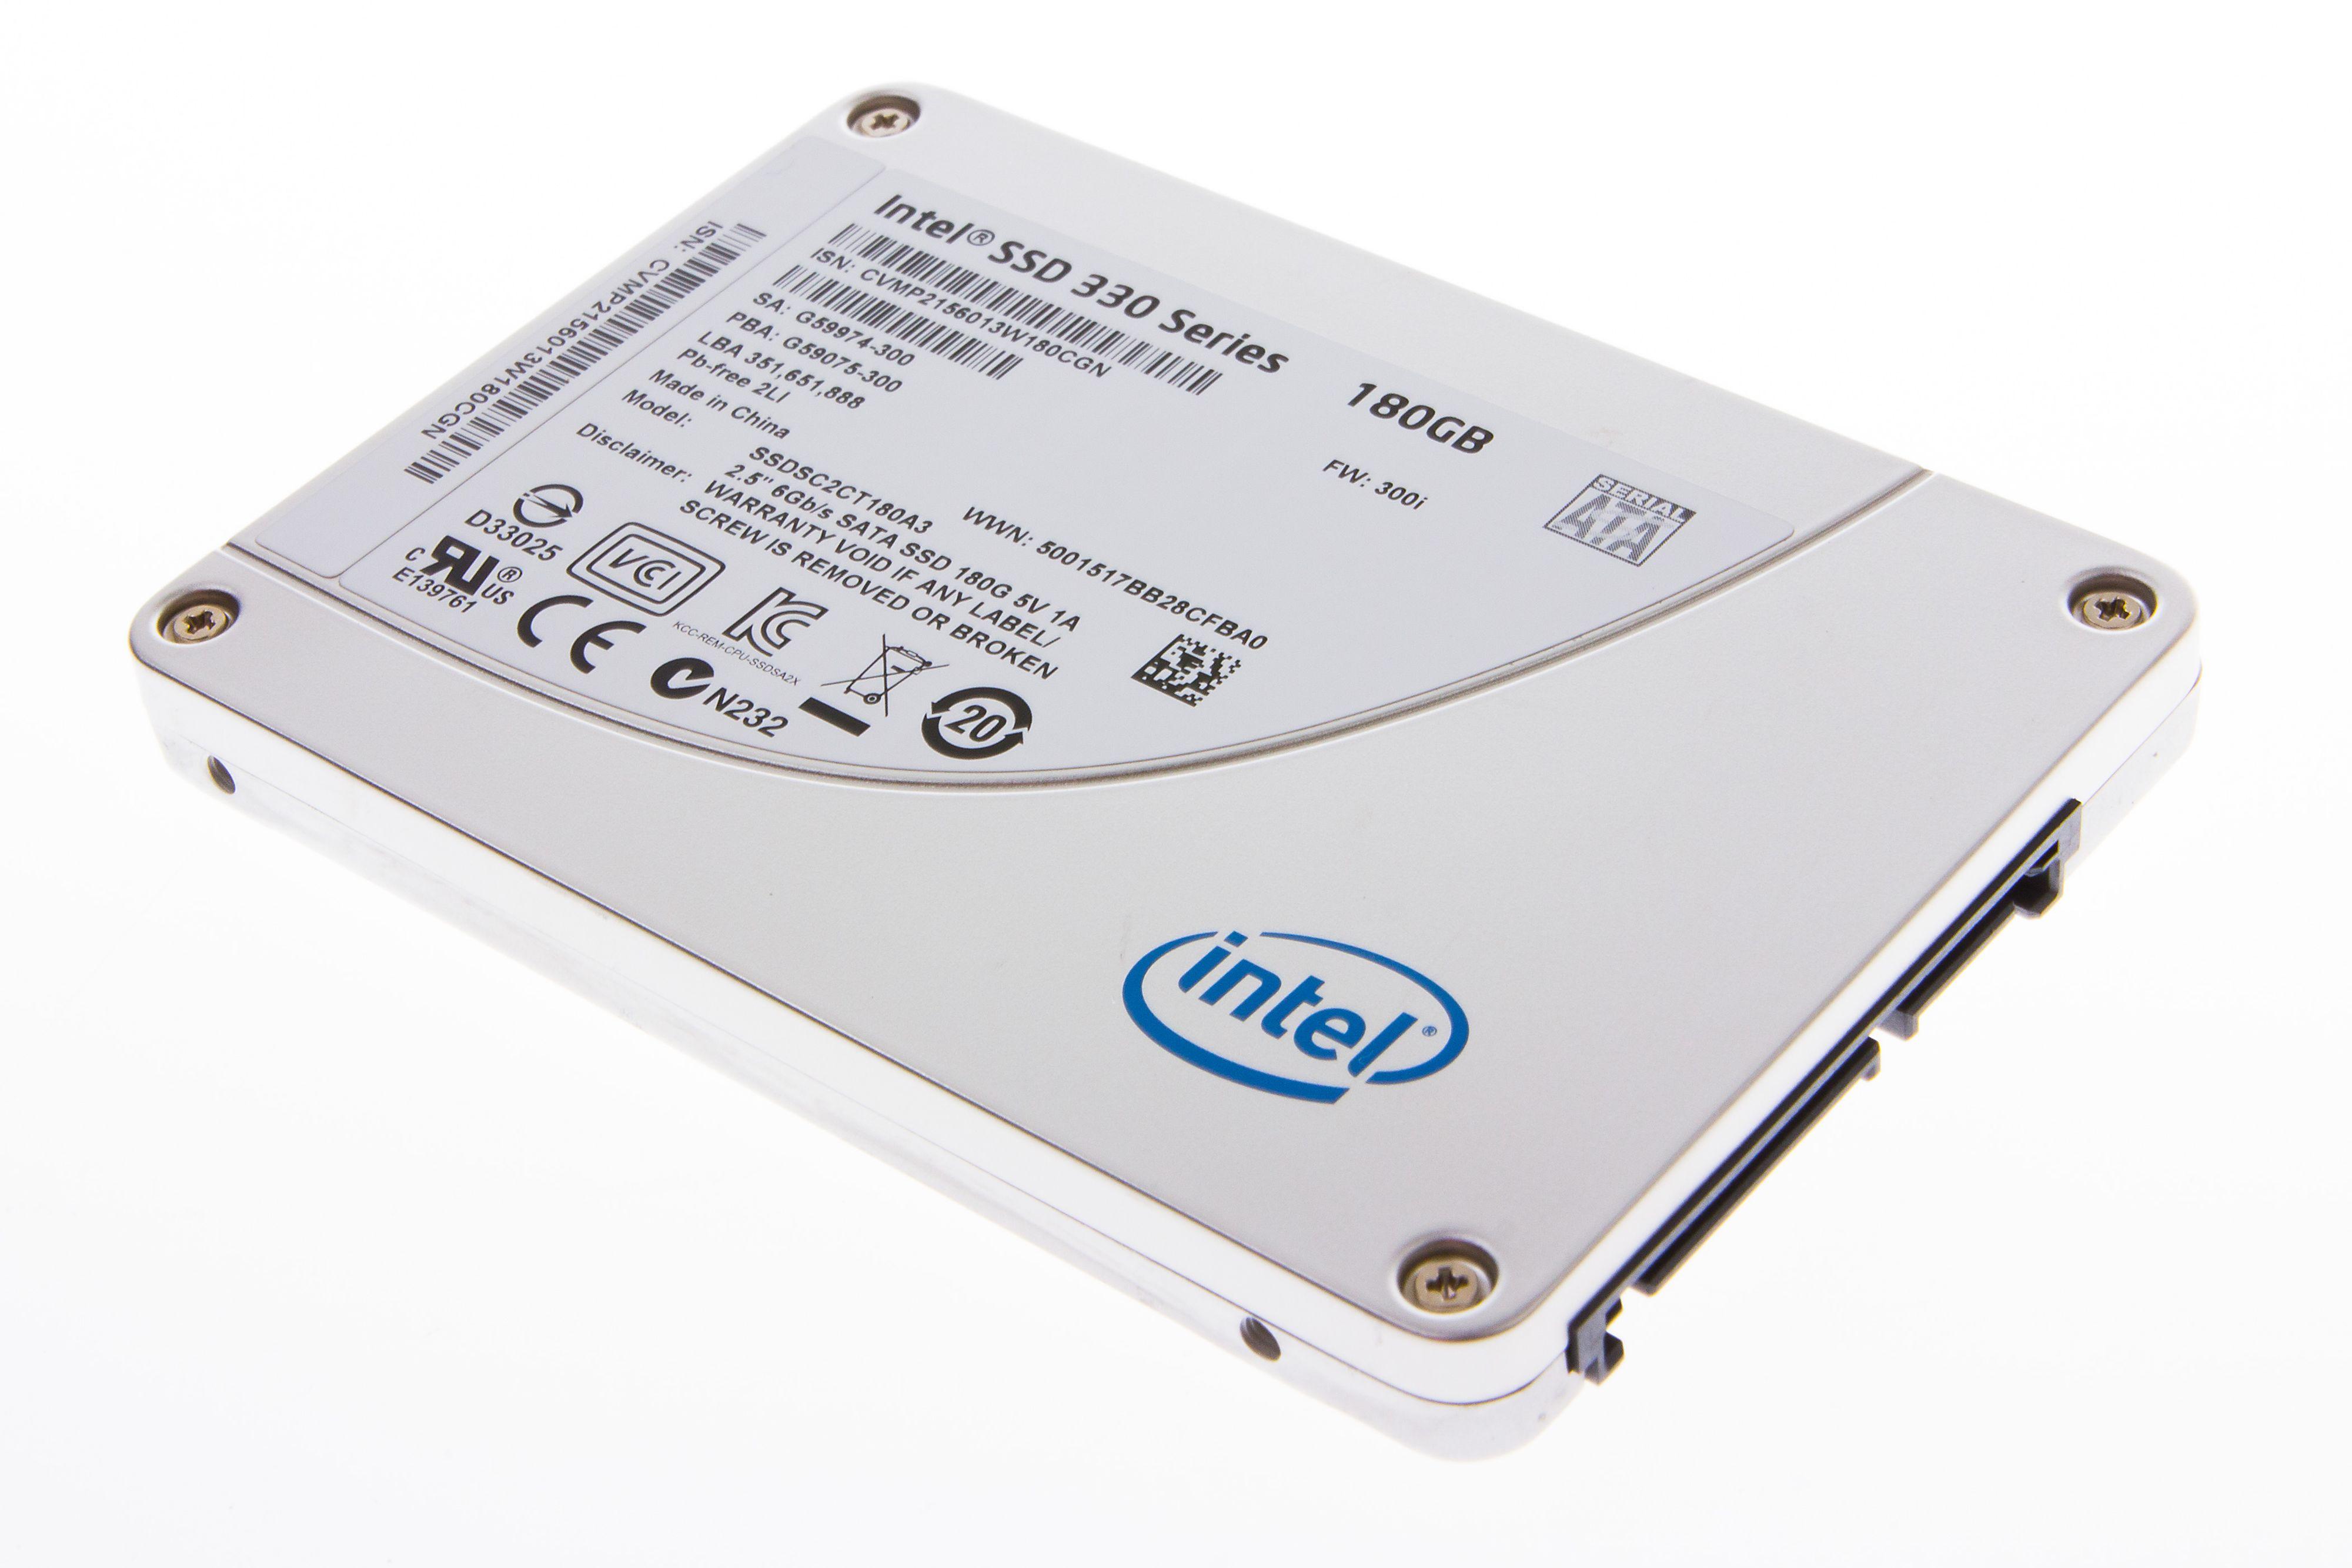 Intel 330 Series SSD 180 GB utenpå.Foto: Jørgen Elton Nilsen, Hardware.no